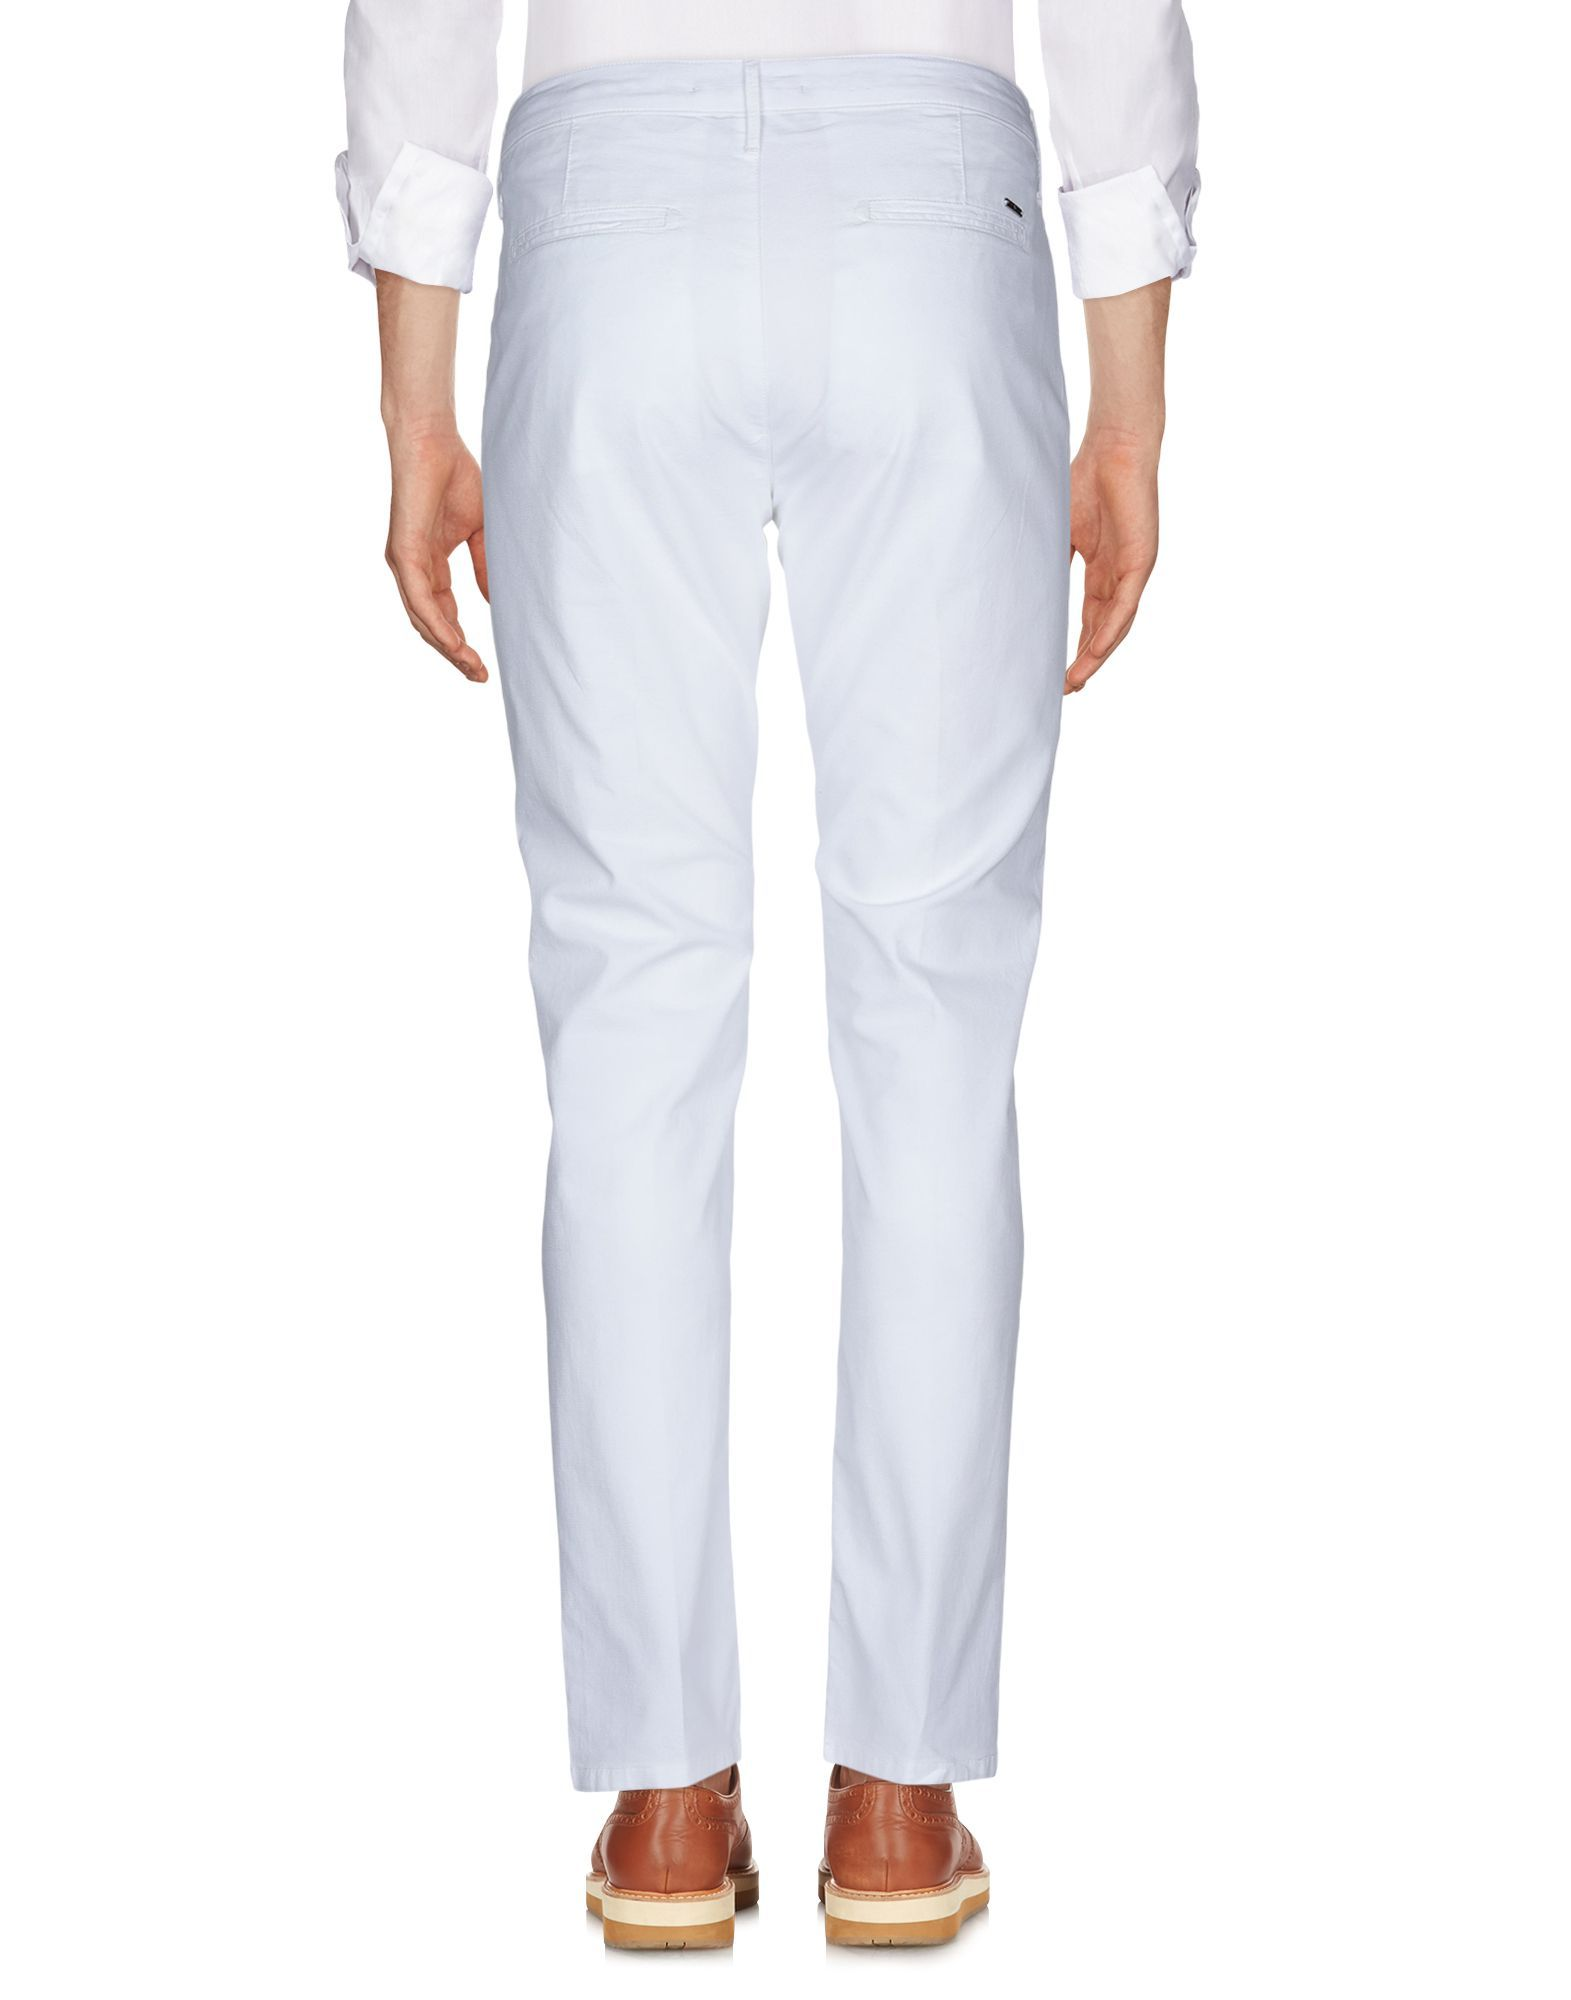 Oaks White Cotton Tapered Leg Chino Trousers